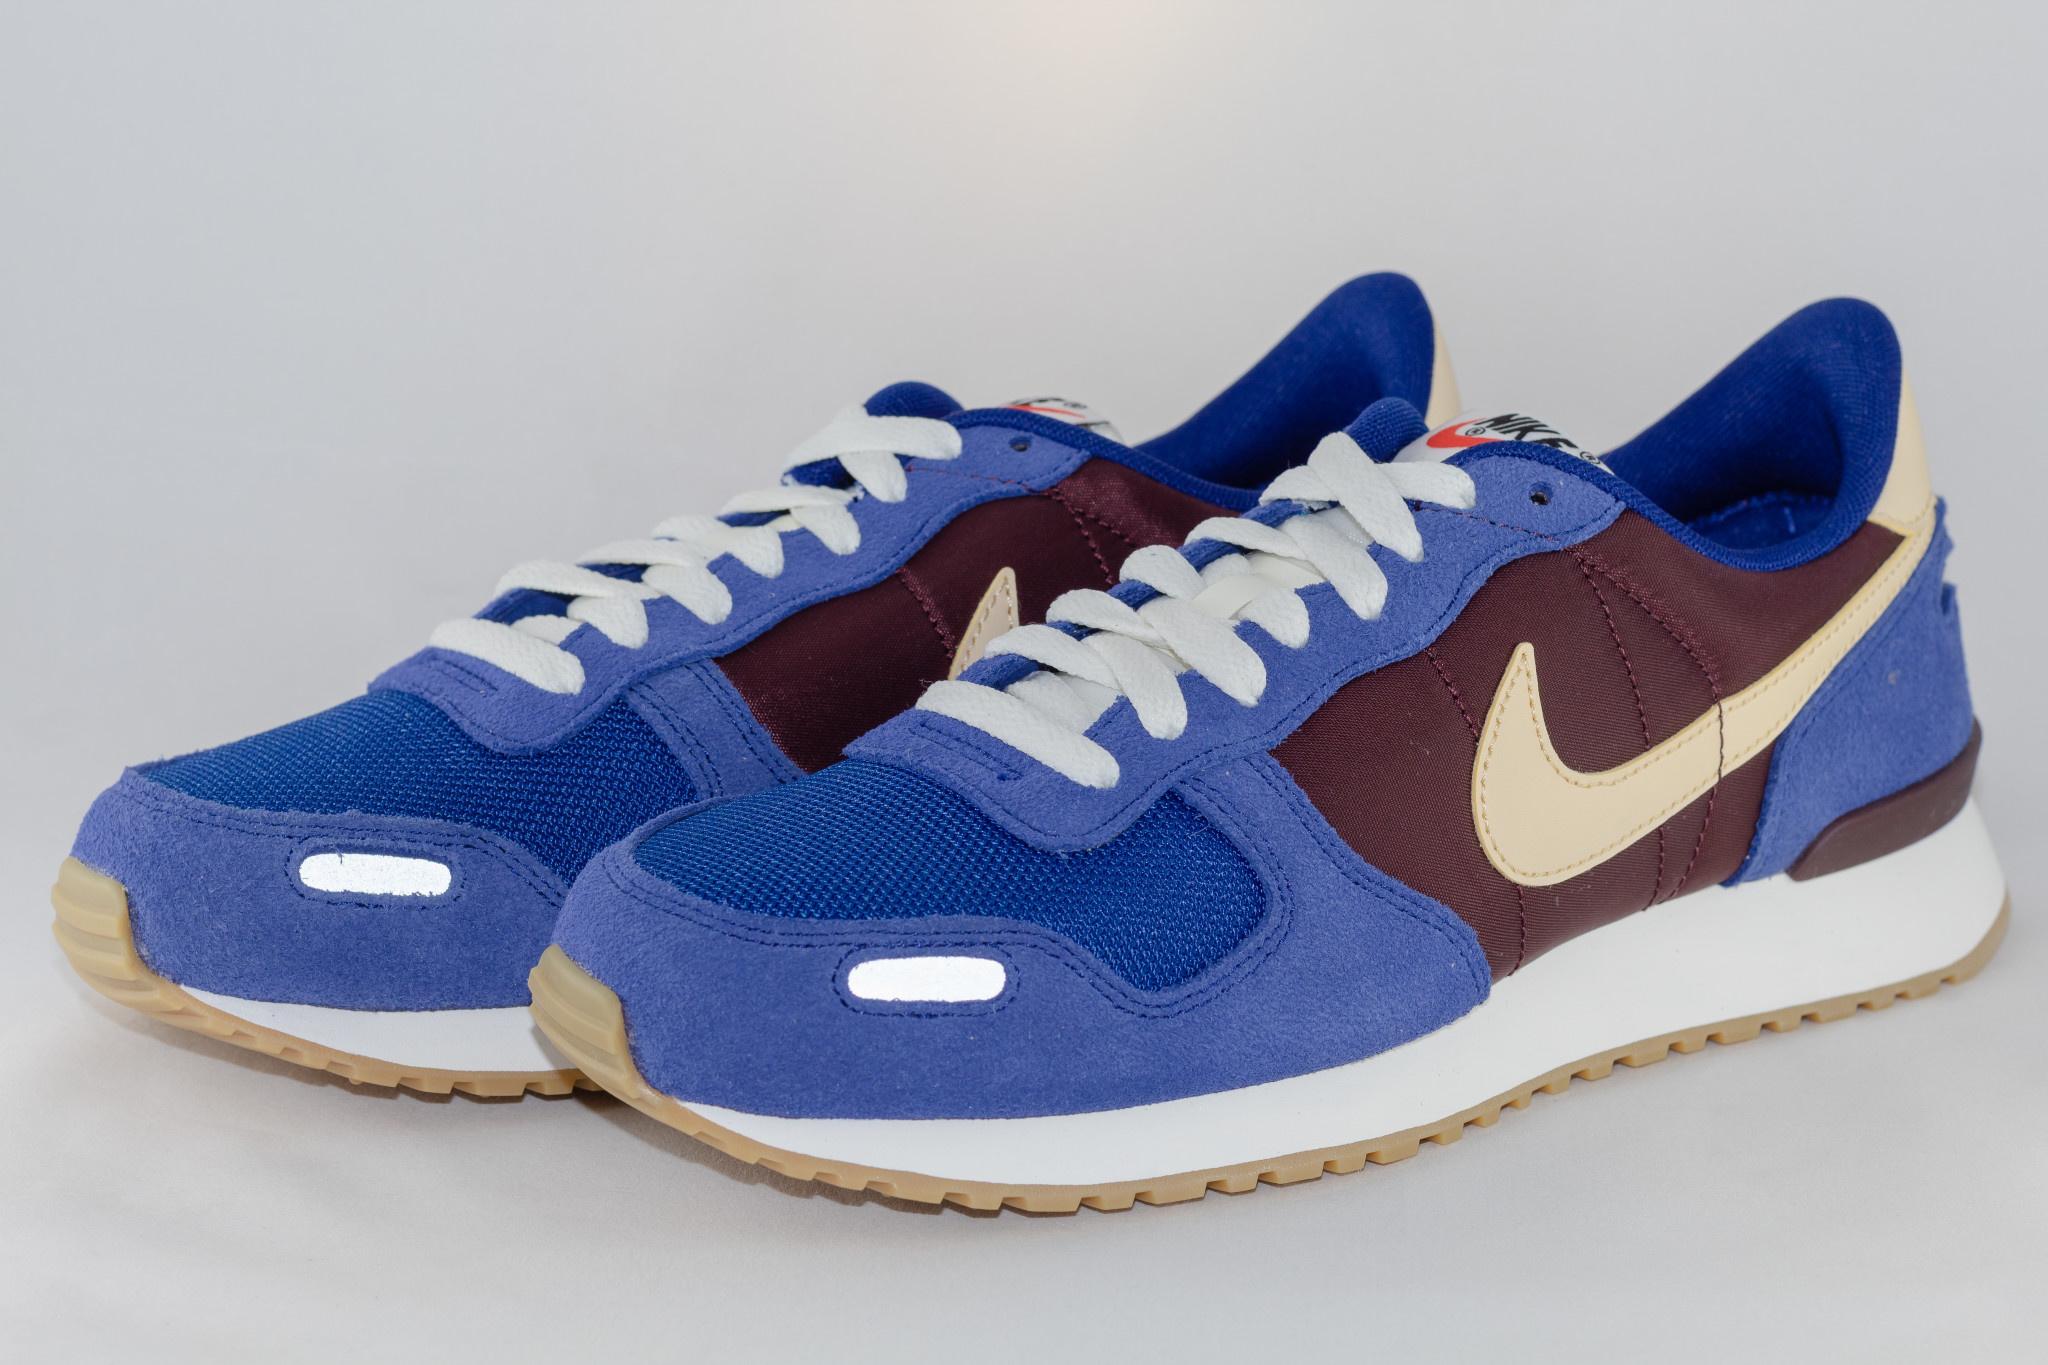 Nike NIKE AIR VRTX Deep Royal Blue/ Pale Vanilla